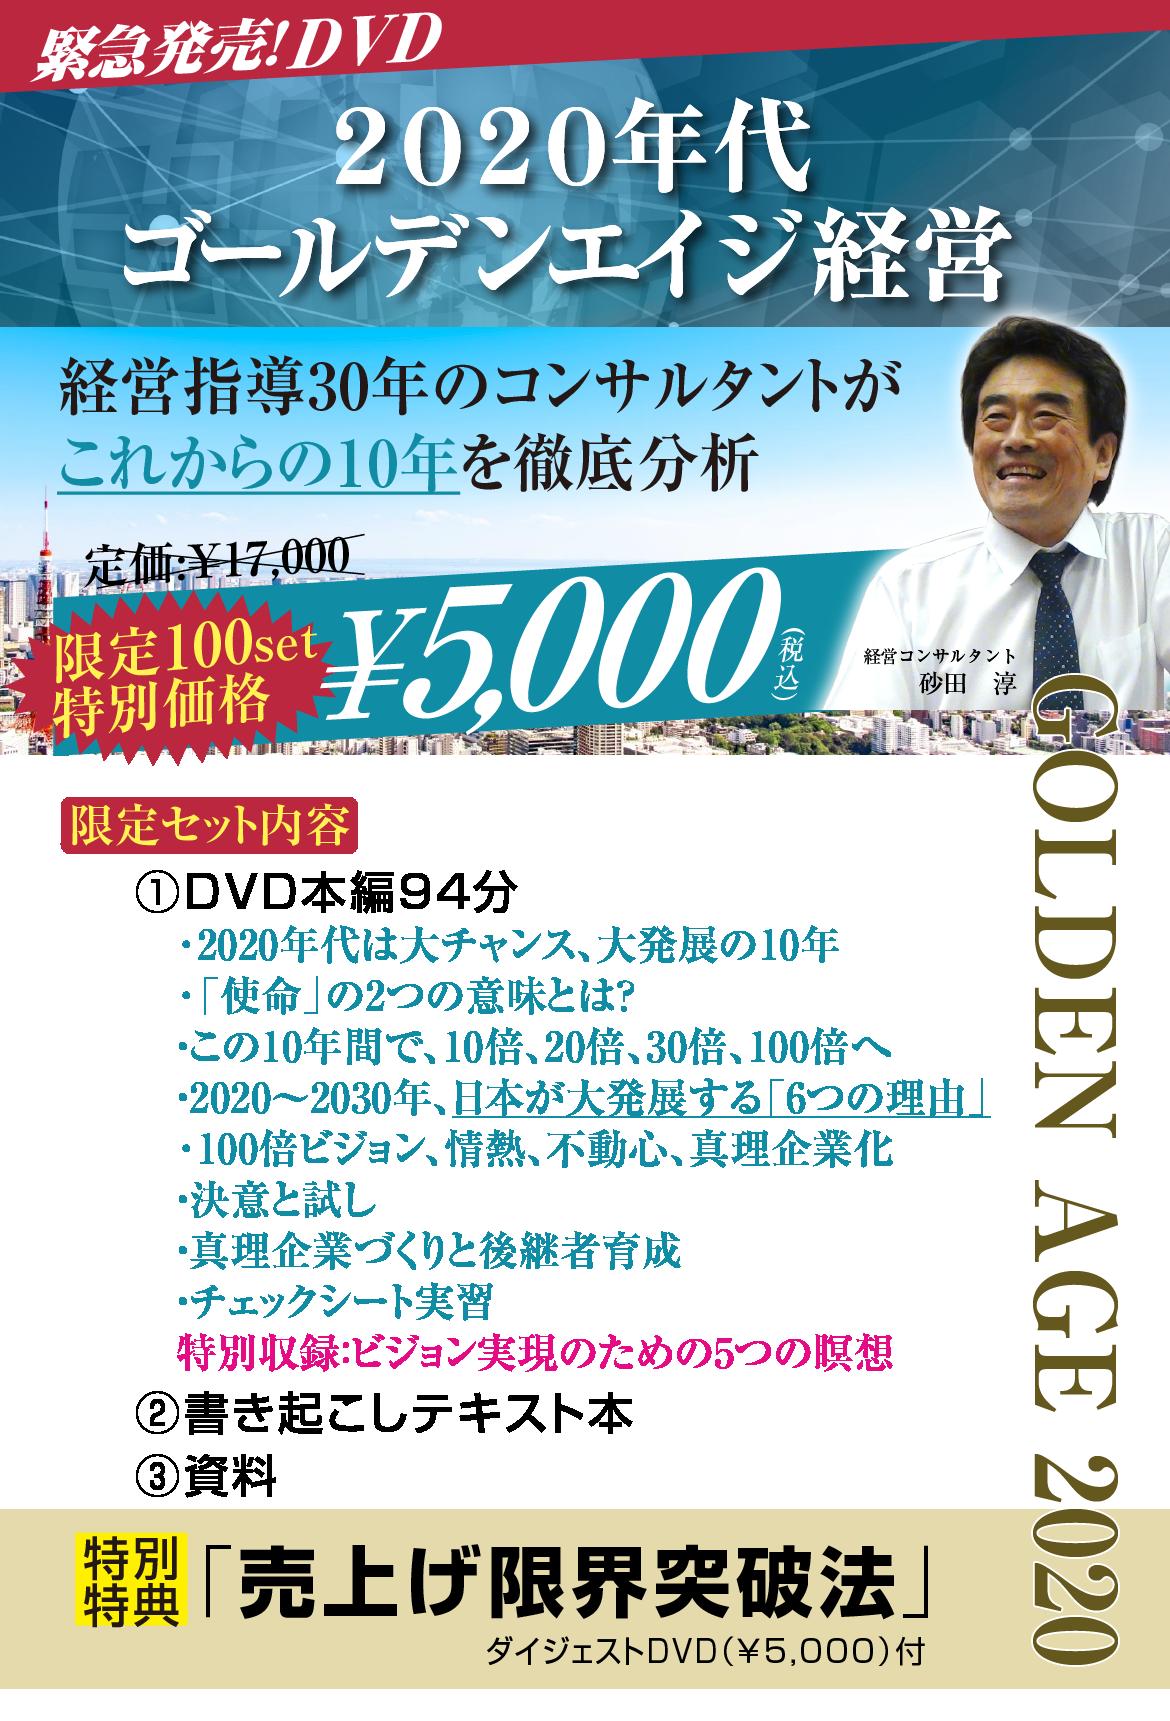 DVD2020年代ゴールデンエイジ経営